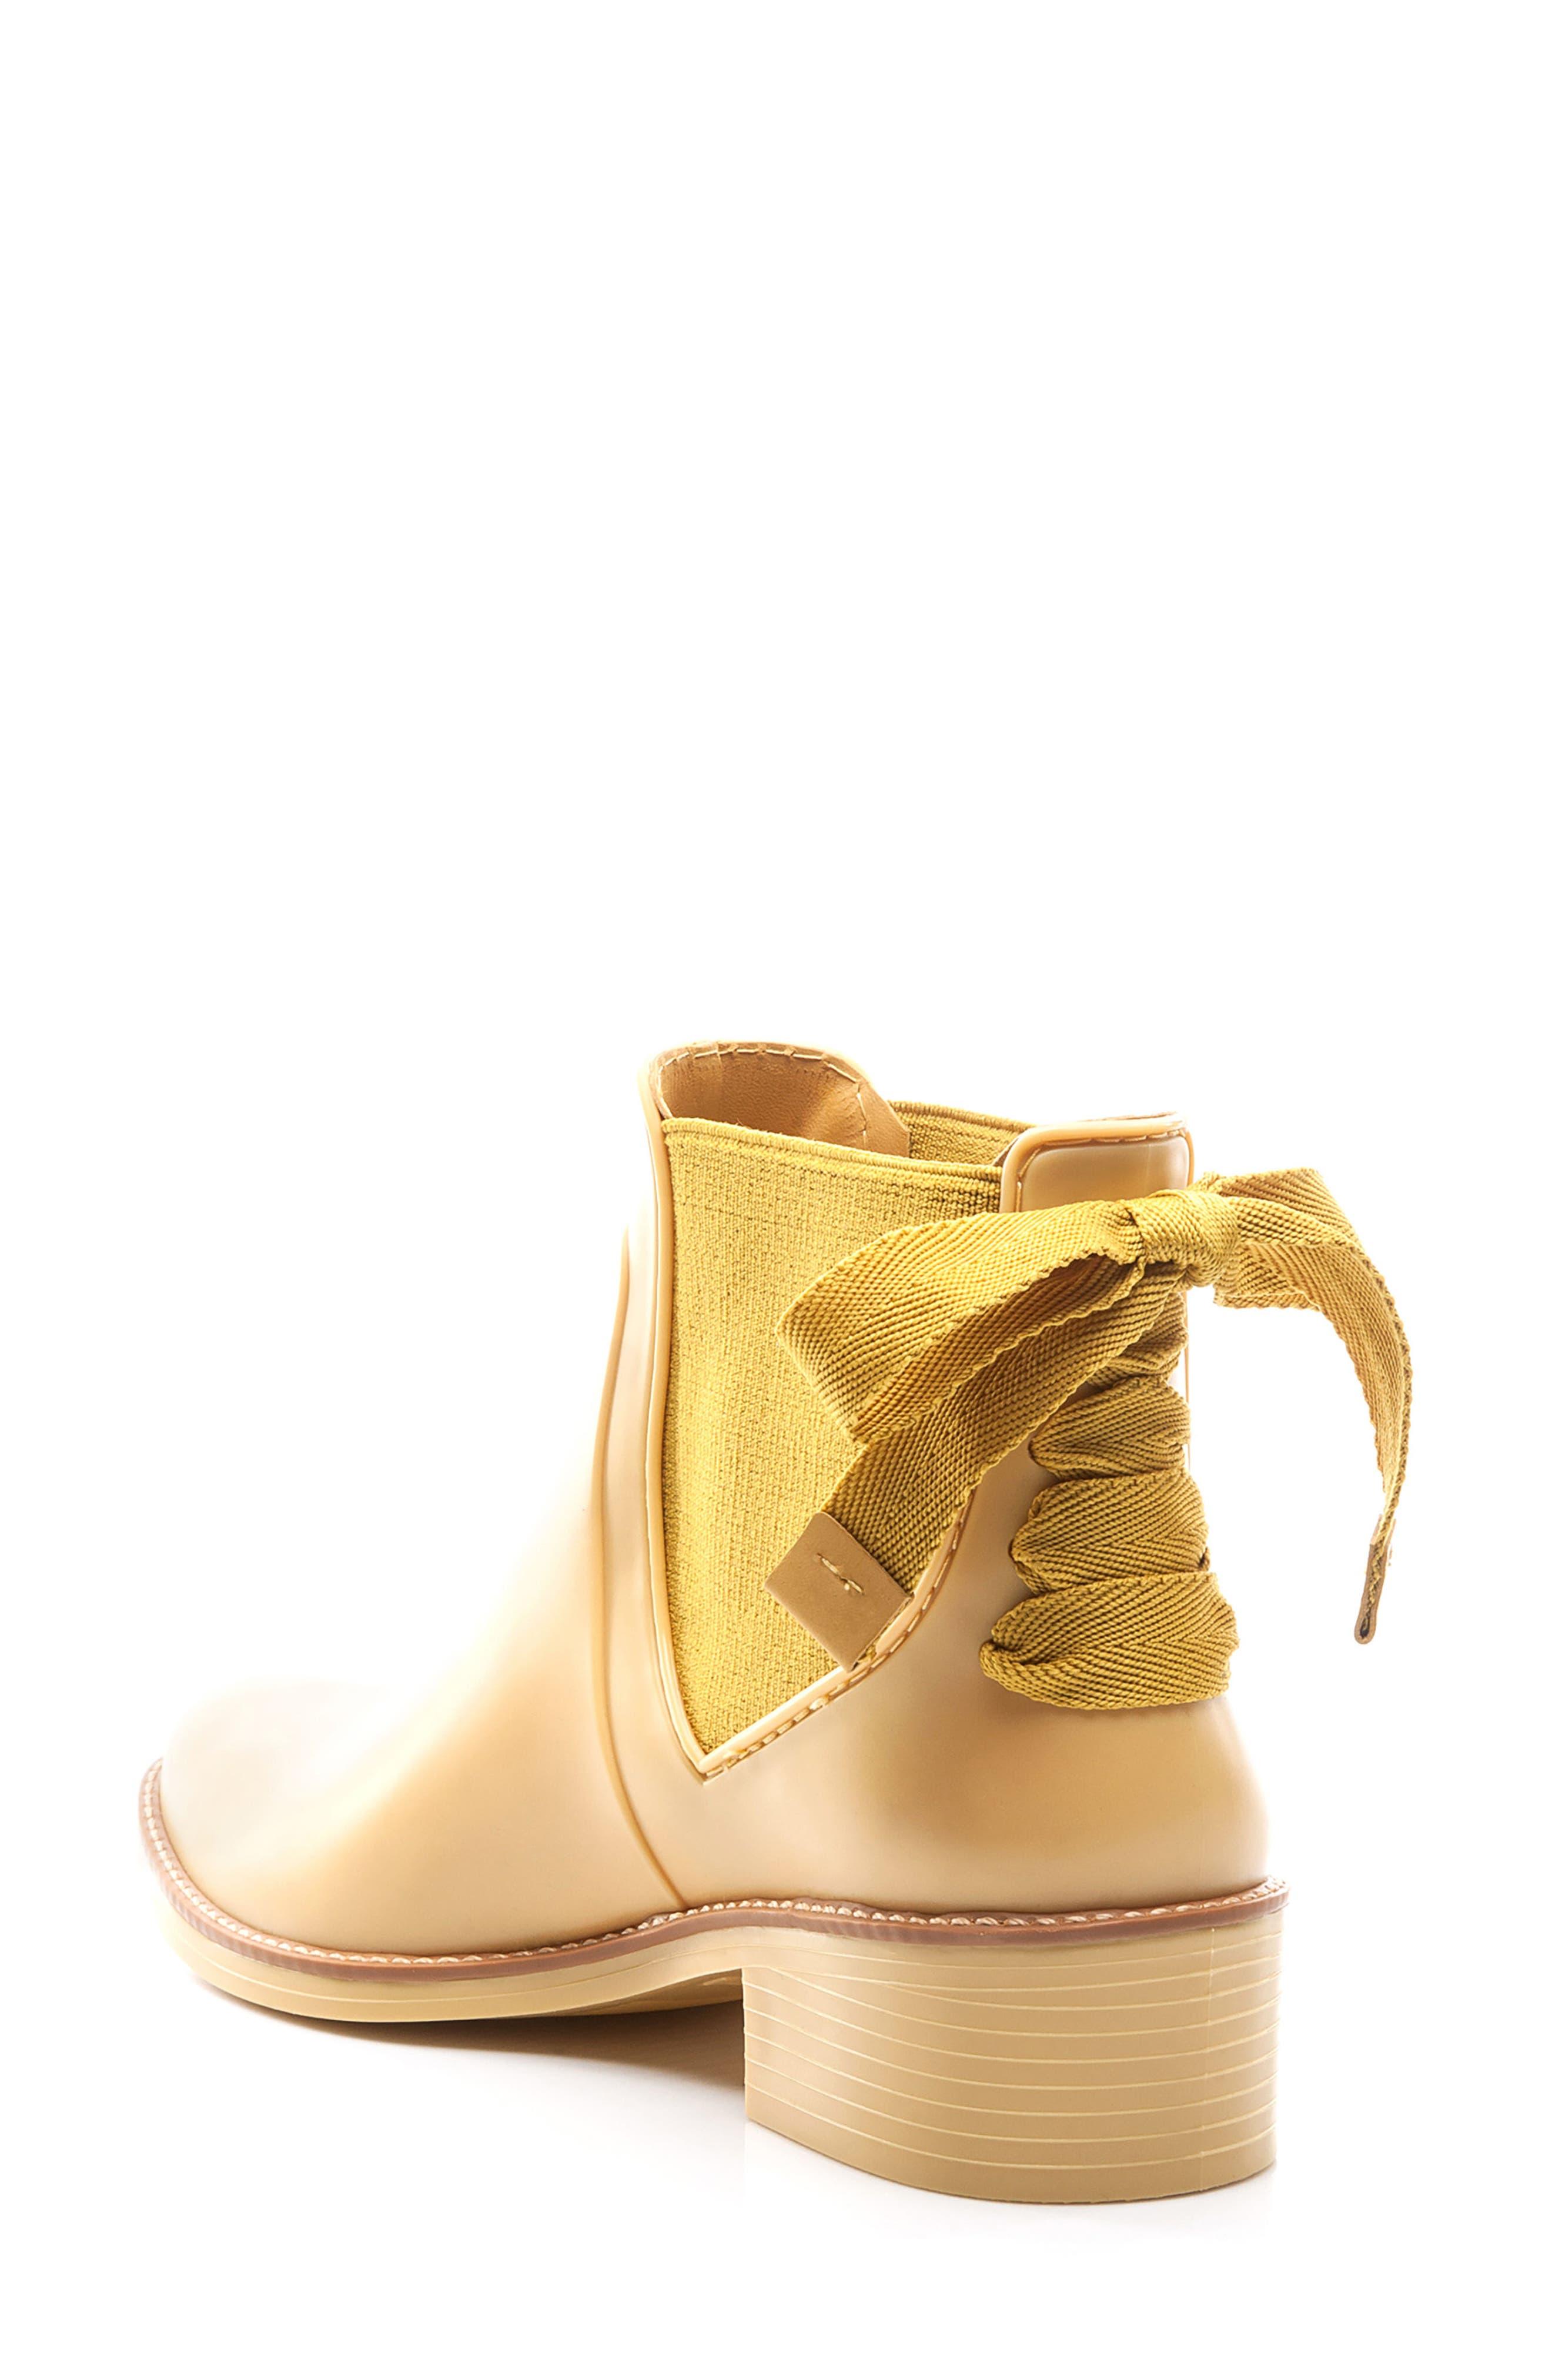 Paige Rain Boot,                             Alternate thumbnail 2, color,                             Yellow